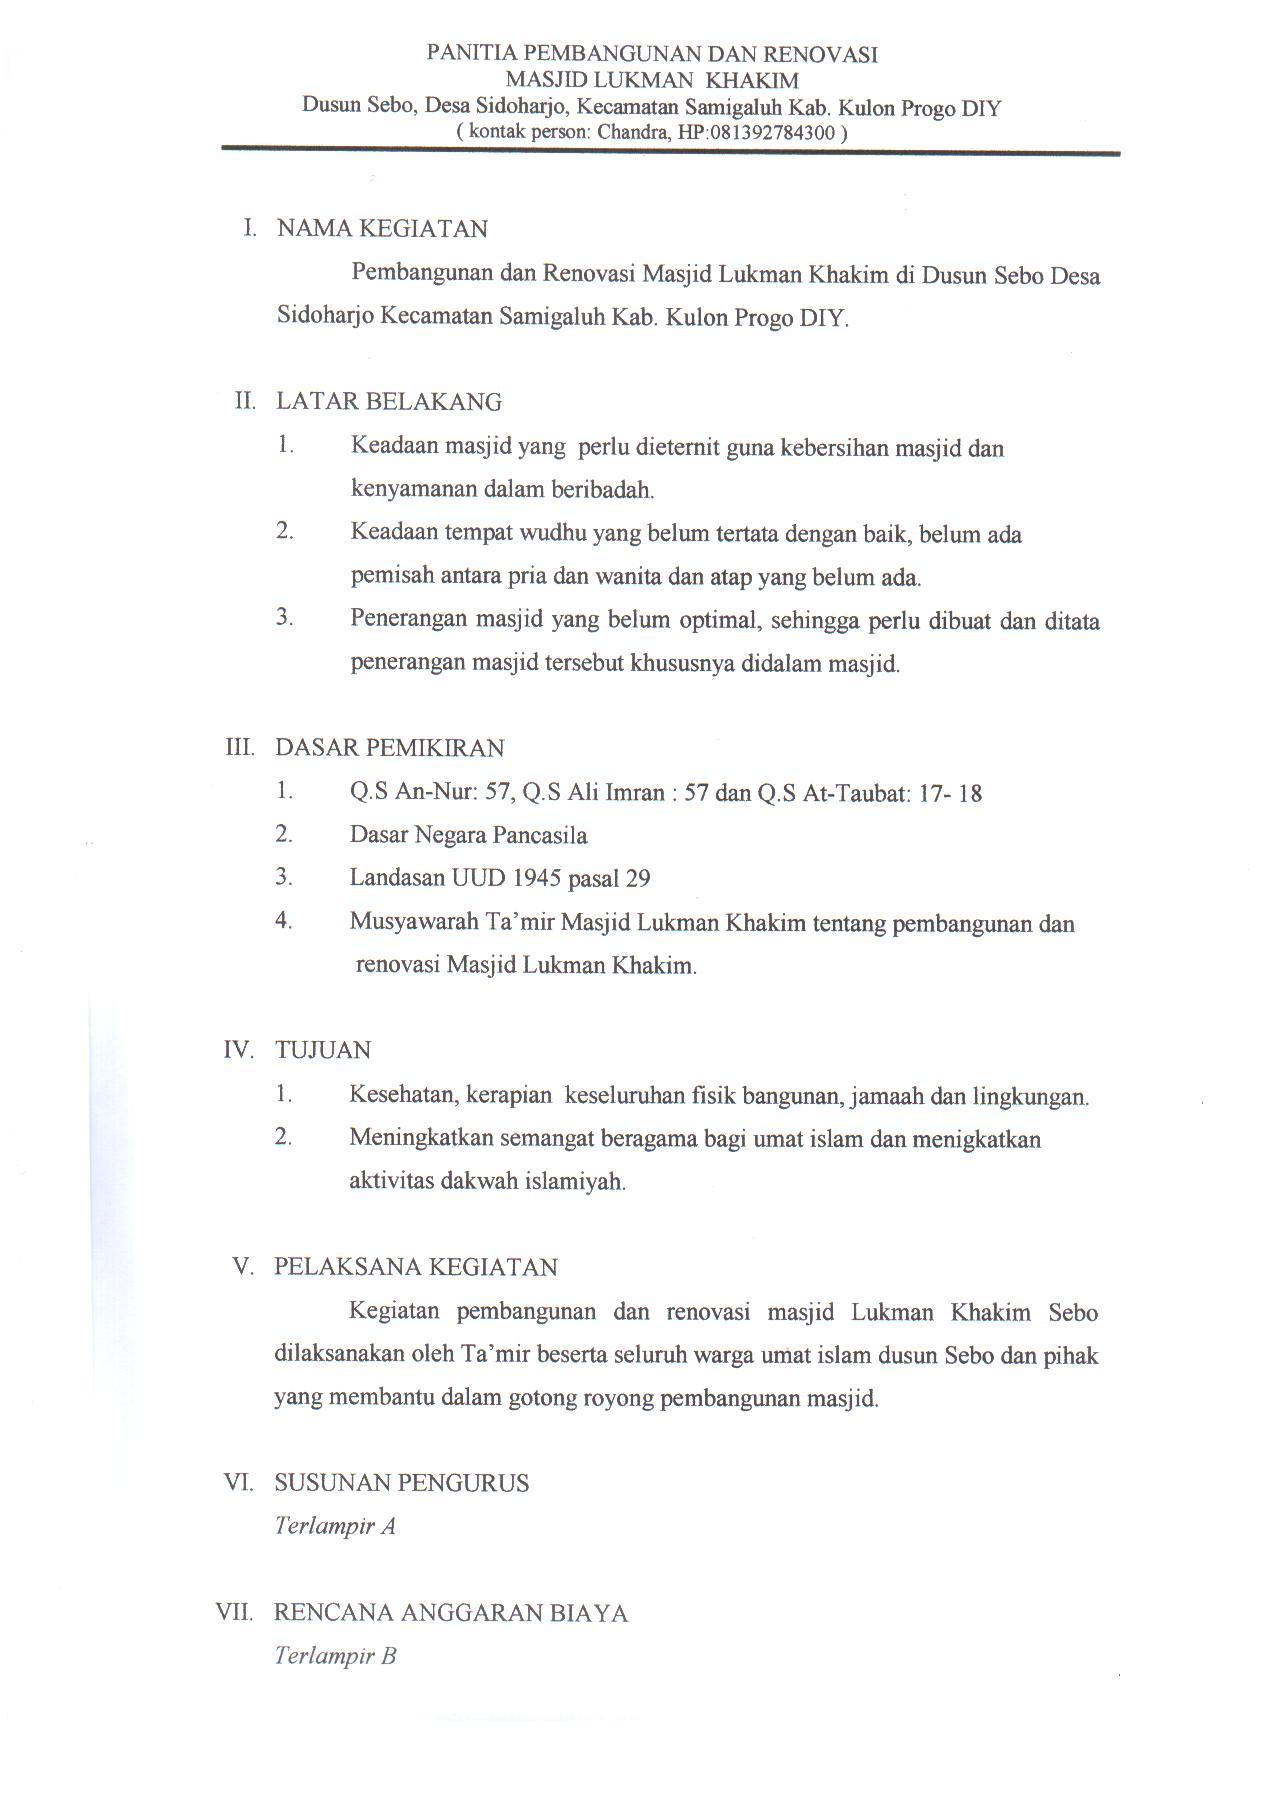 Proposal Pembangunan dan Renovasi Masjid Lukman Khakim